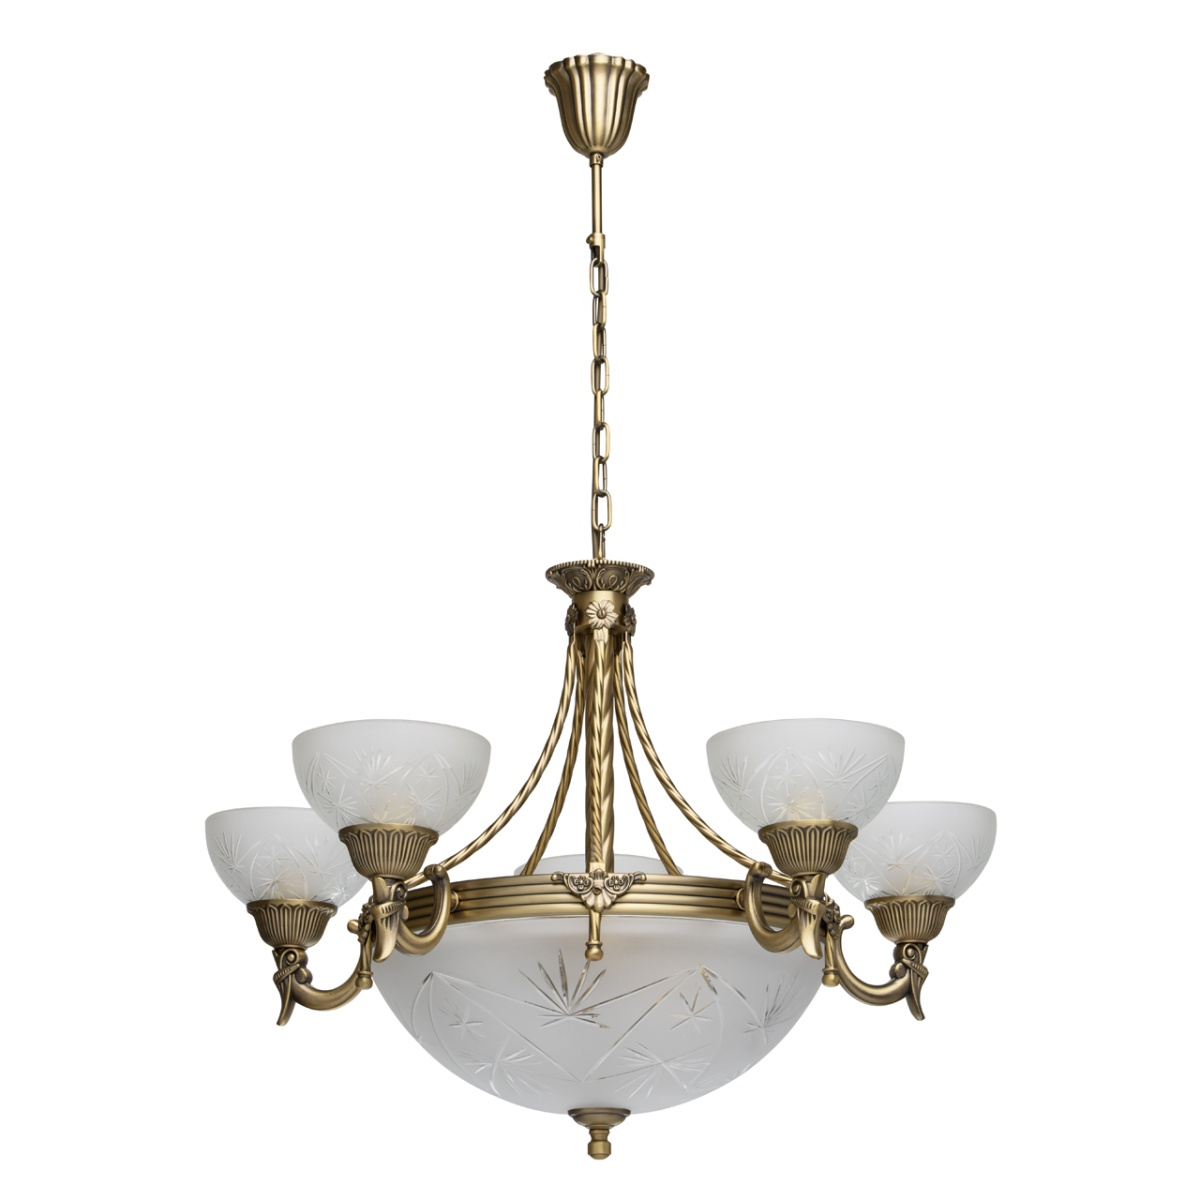 Candelabru MW-Light Classic 317011708 vivre.ro